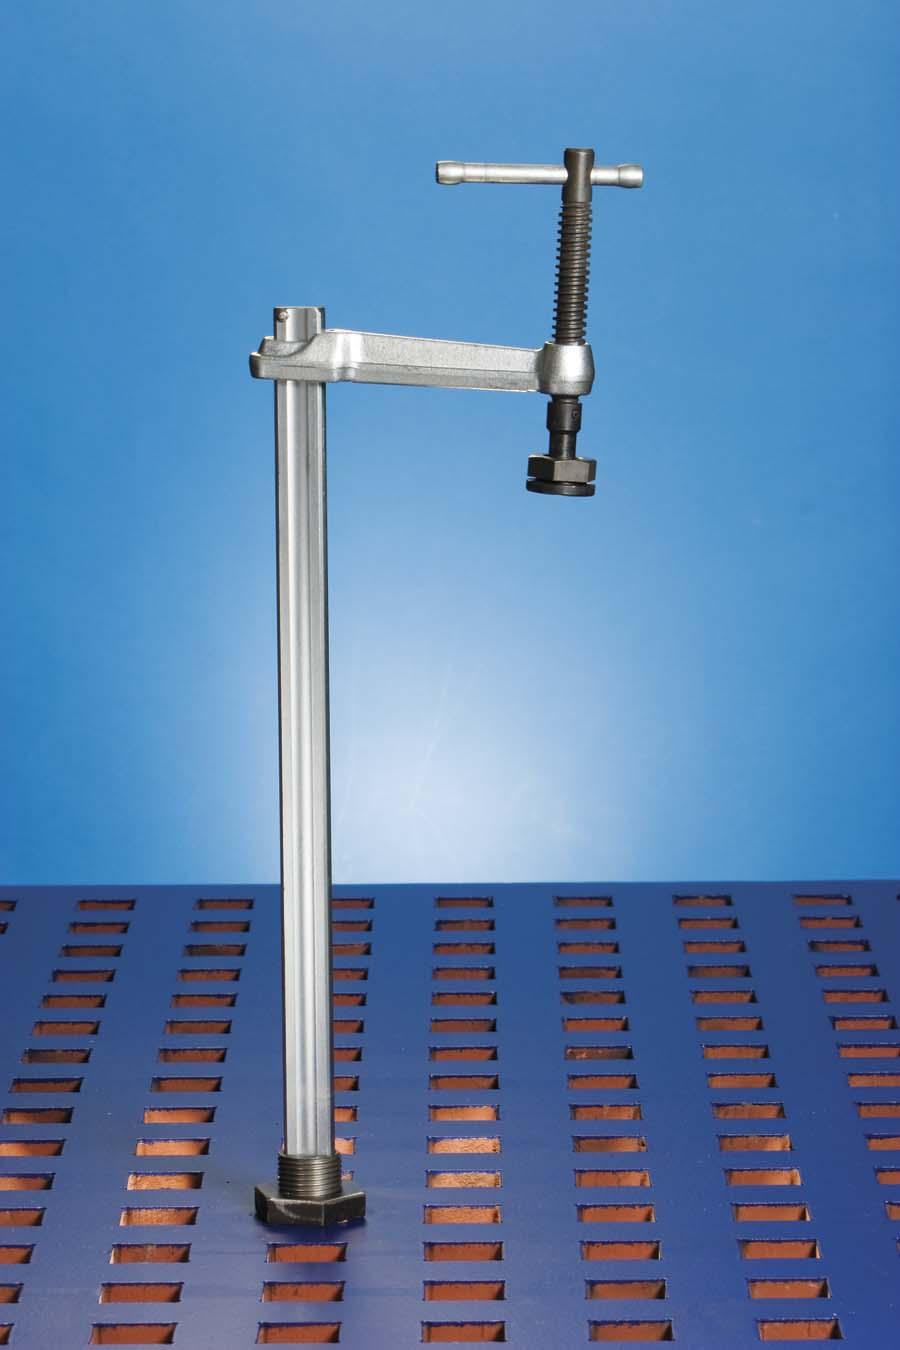 Weldsale 16 Quot Envelope Bolt Down Vertical Clamp Ws1713416